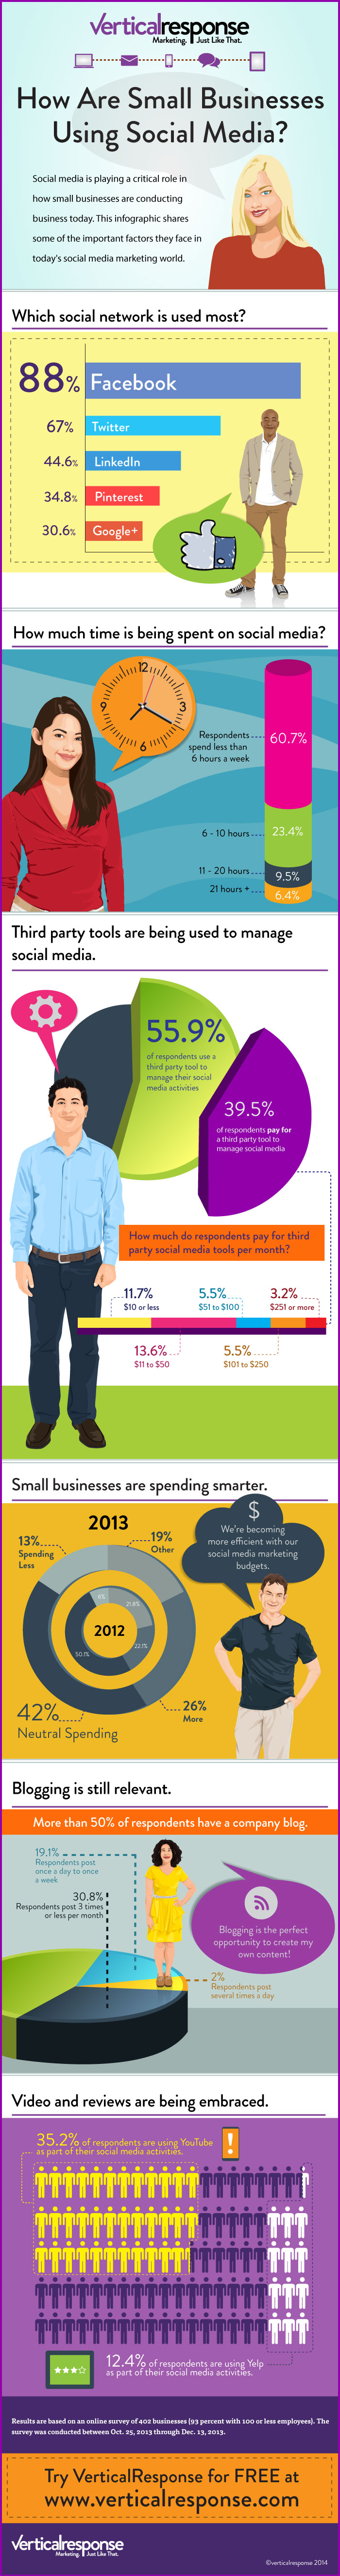 Small Business Survey Reveals Social Media Trends (Infographic) image SmBizSMsurvey 2013 FINAL1